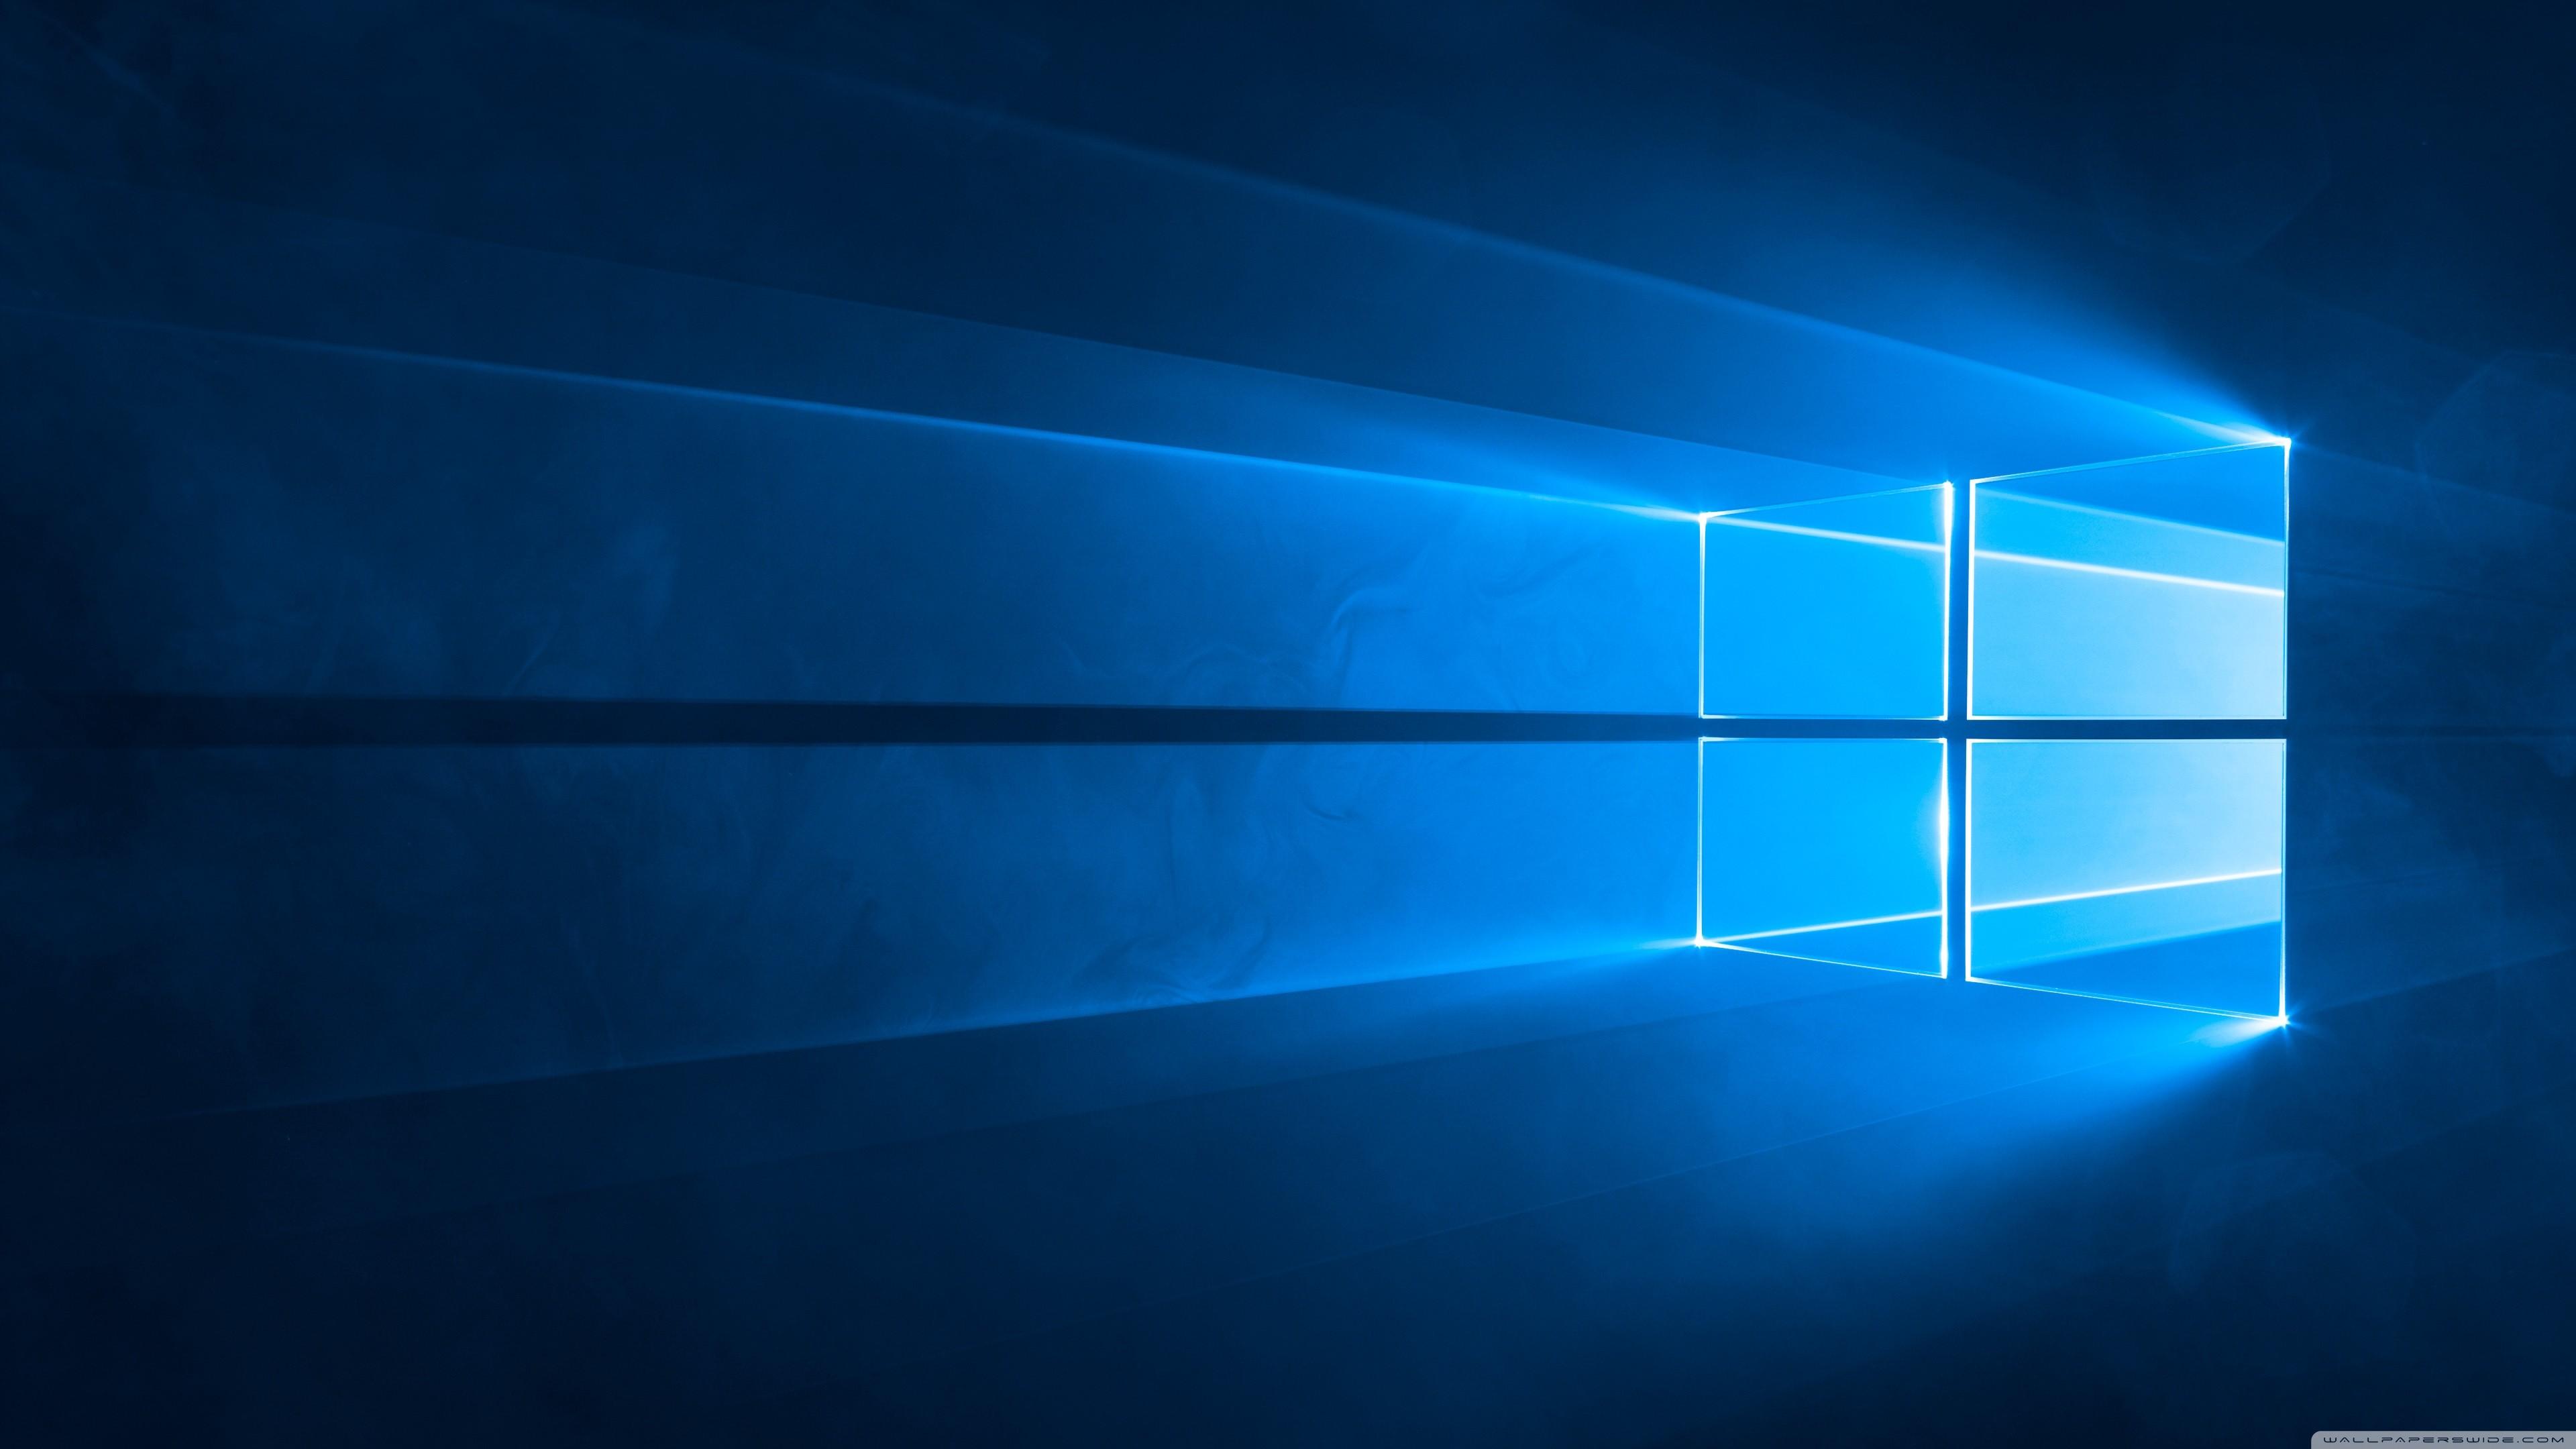 Desktop Wallpapers For Windows 10 83 Images